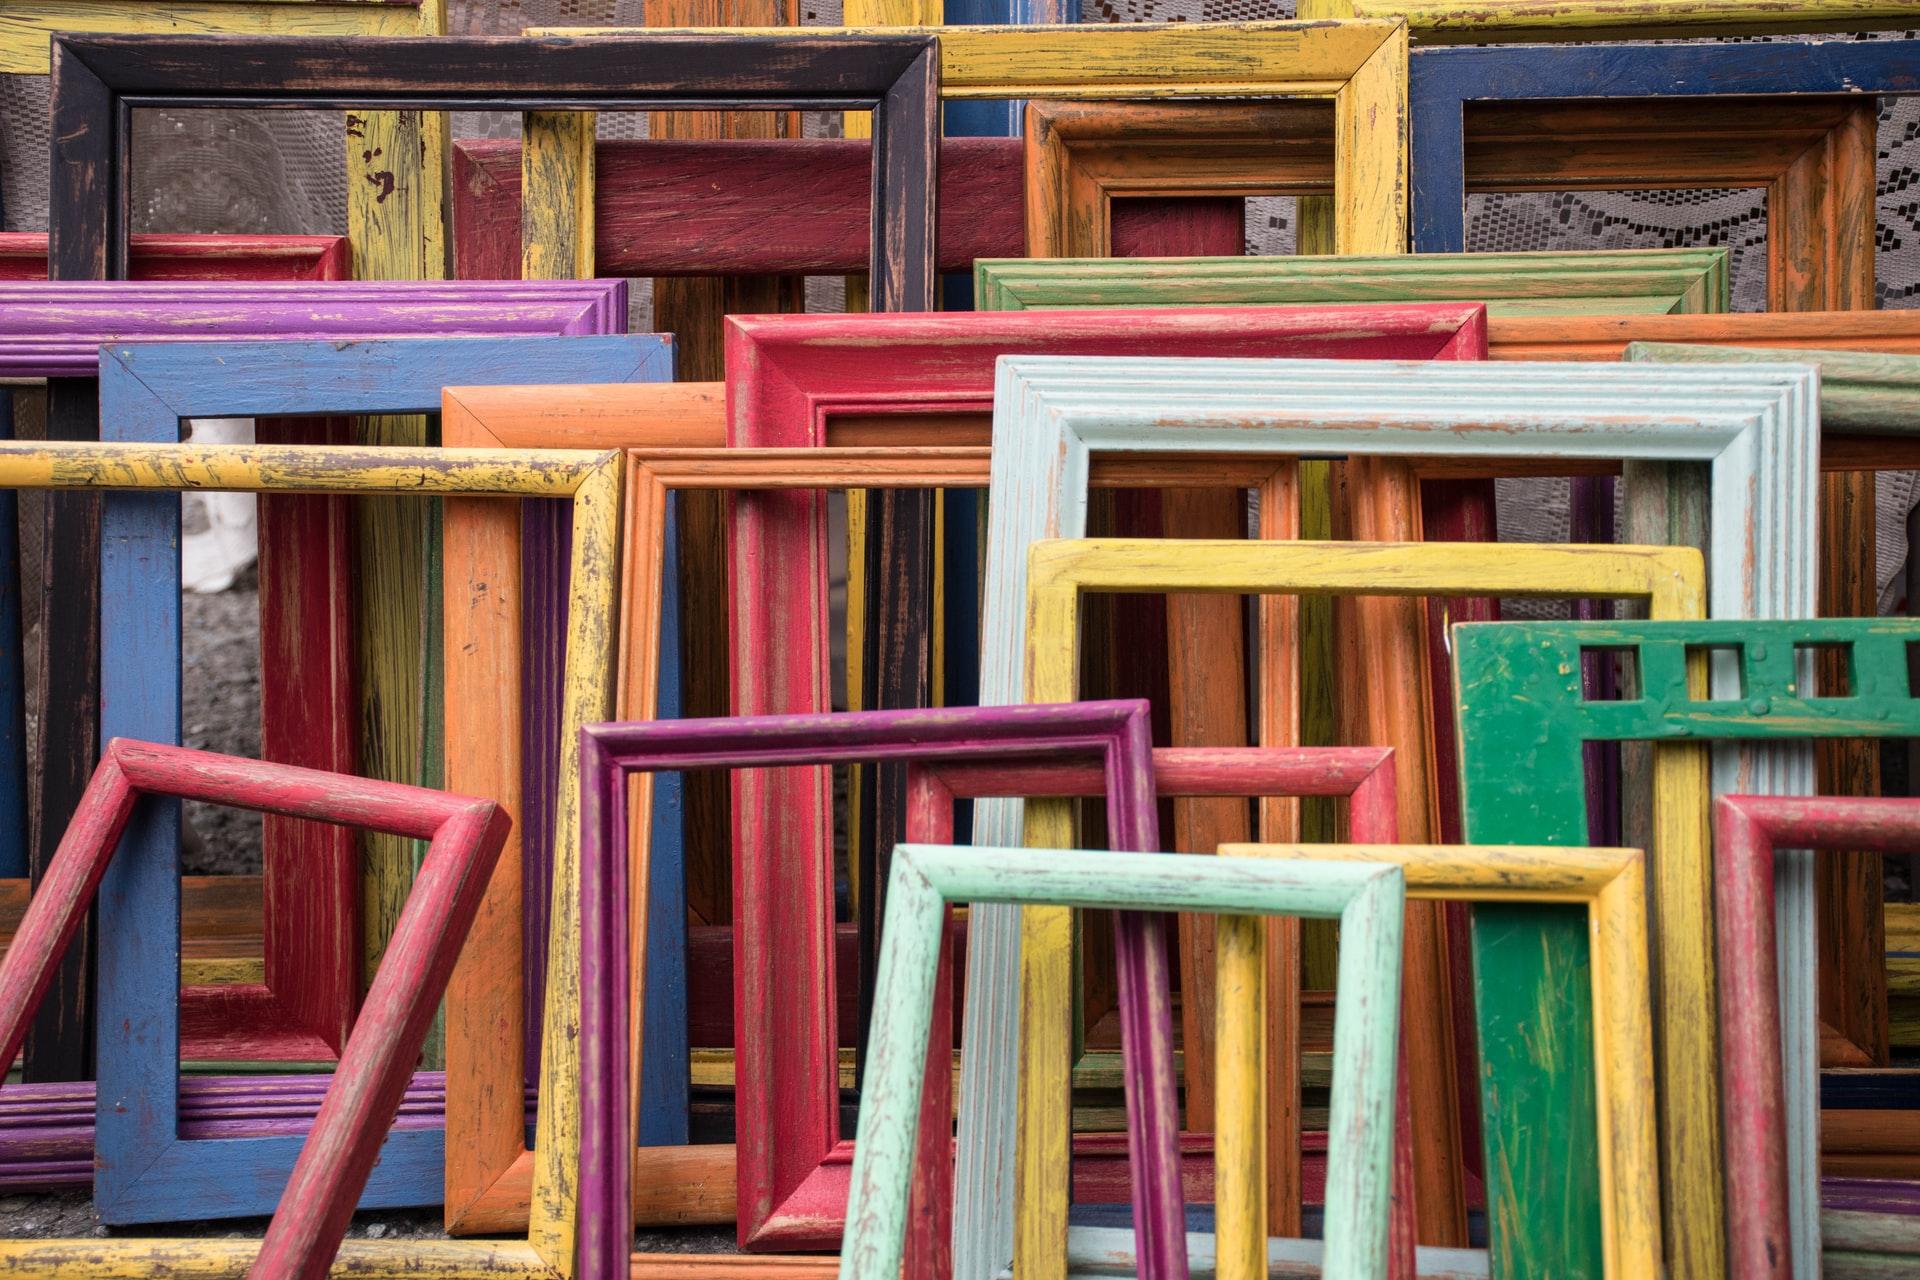 Sell Your Art - Making a Living as an Artist